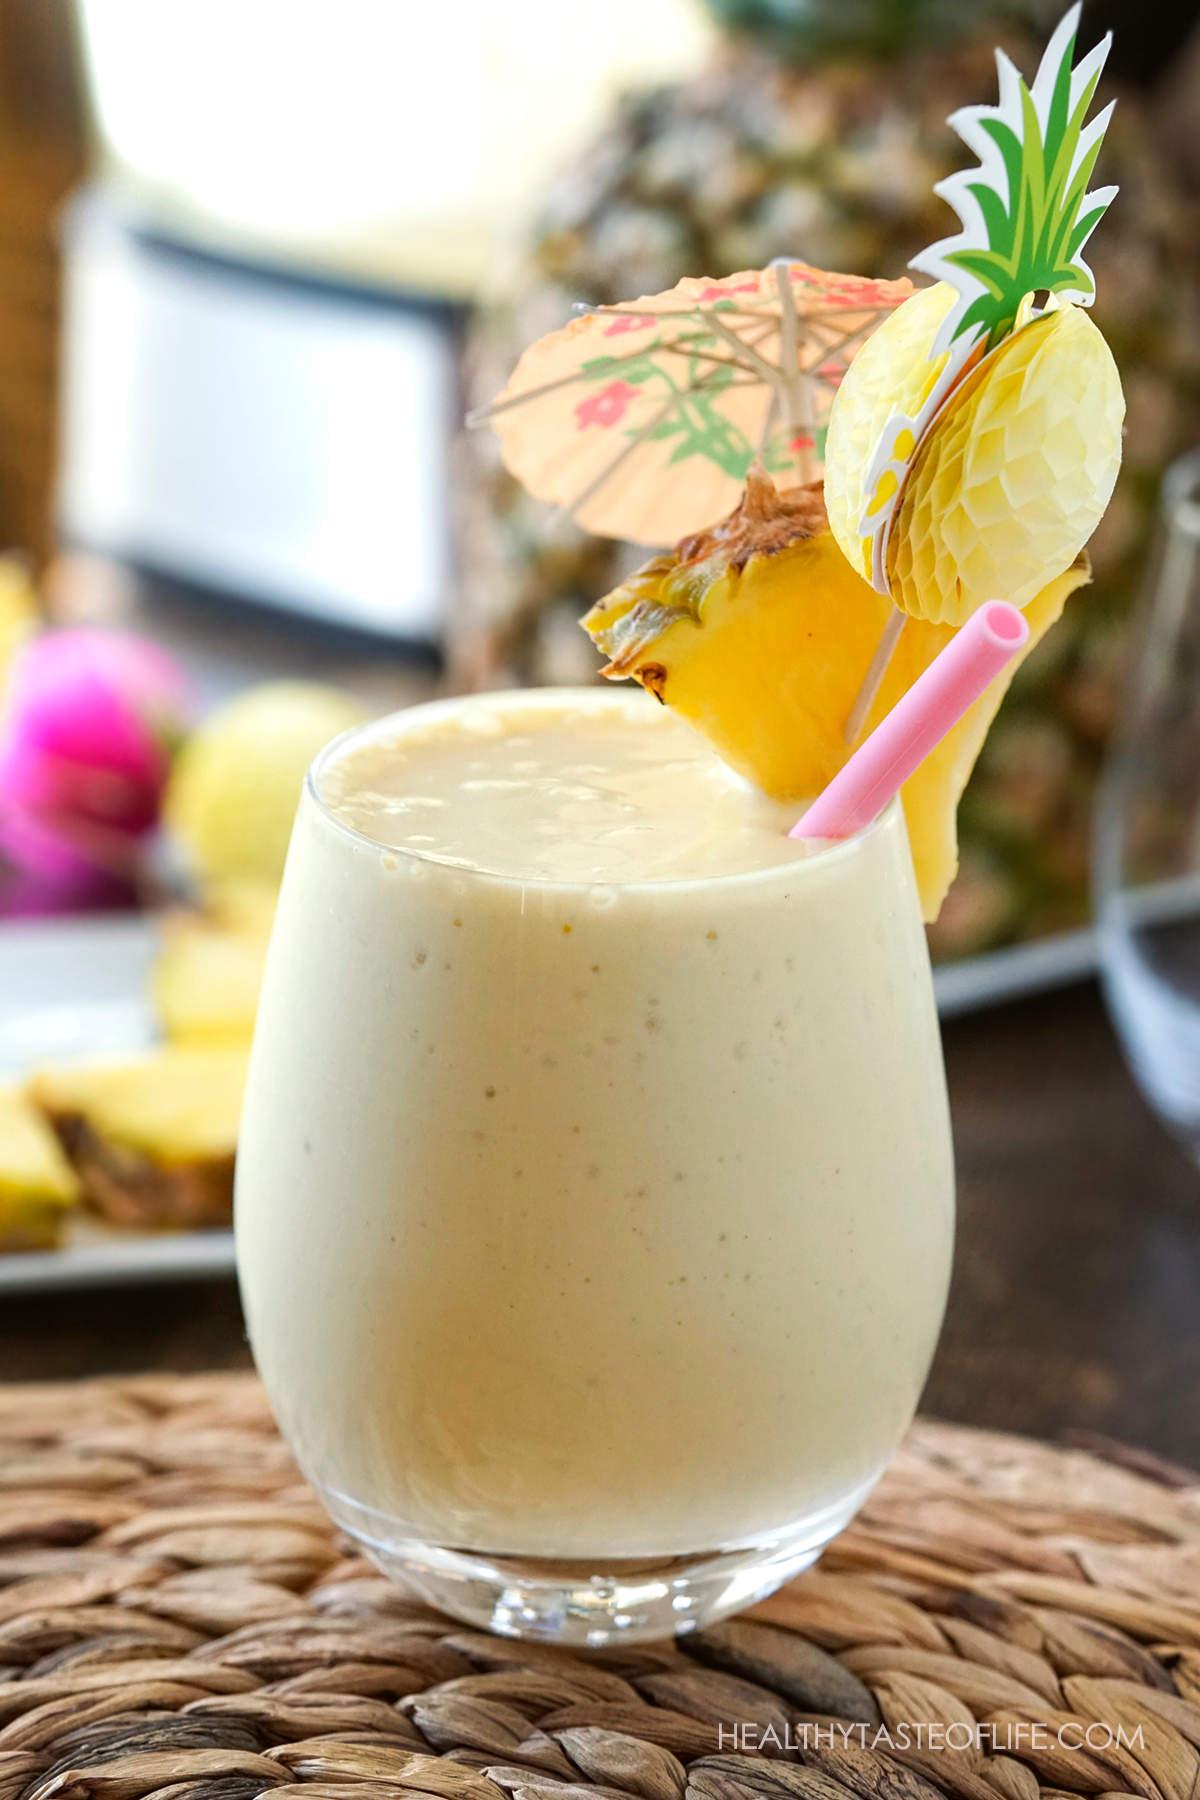 Coconut Milkshake With Pineapple Wedge decorated like pina colada.